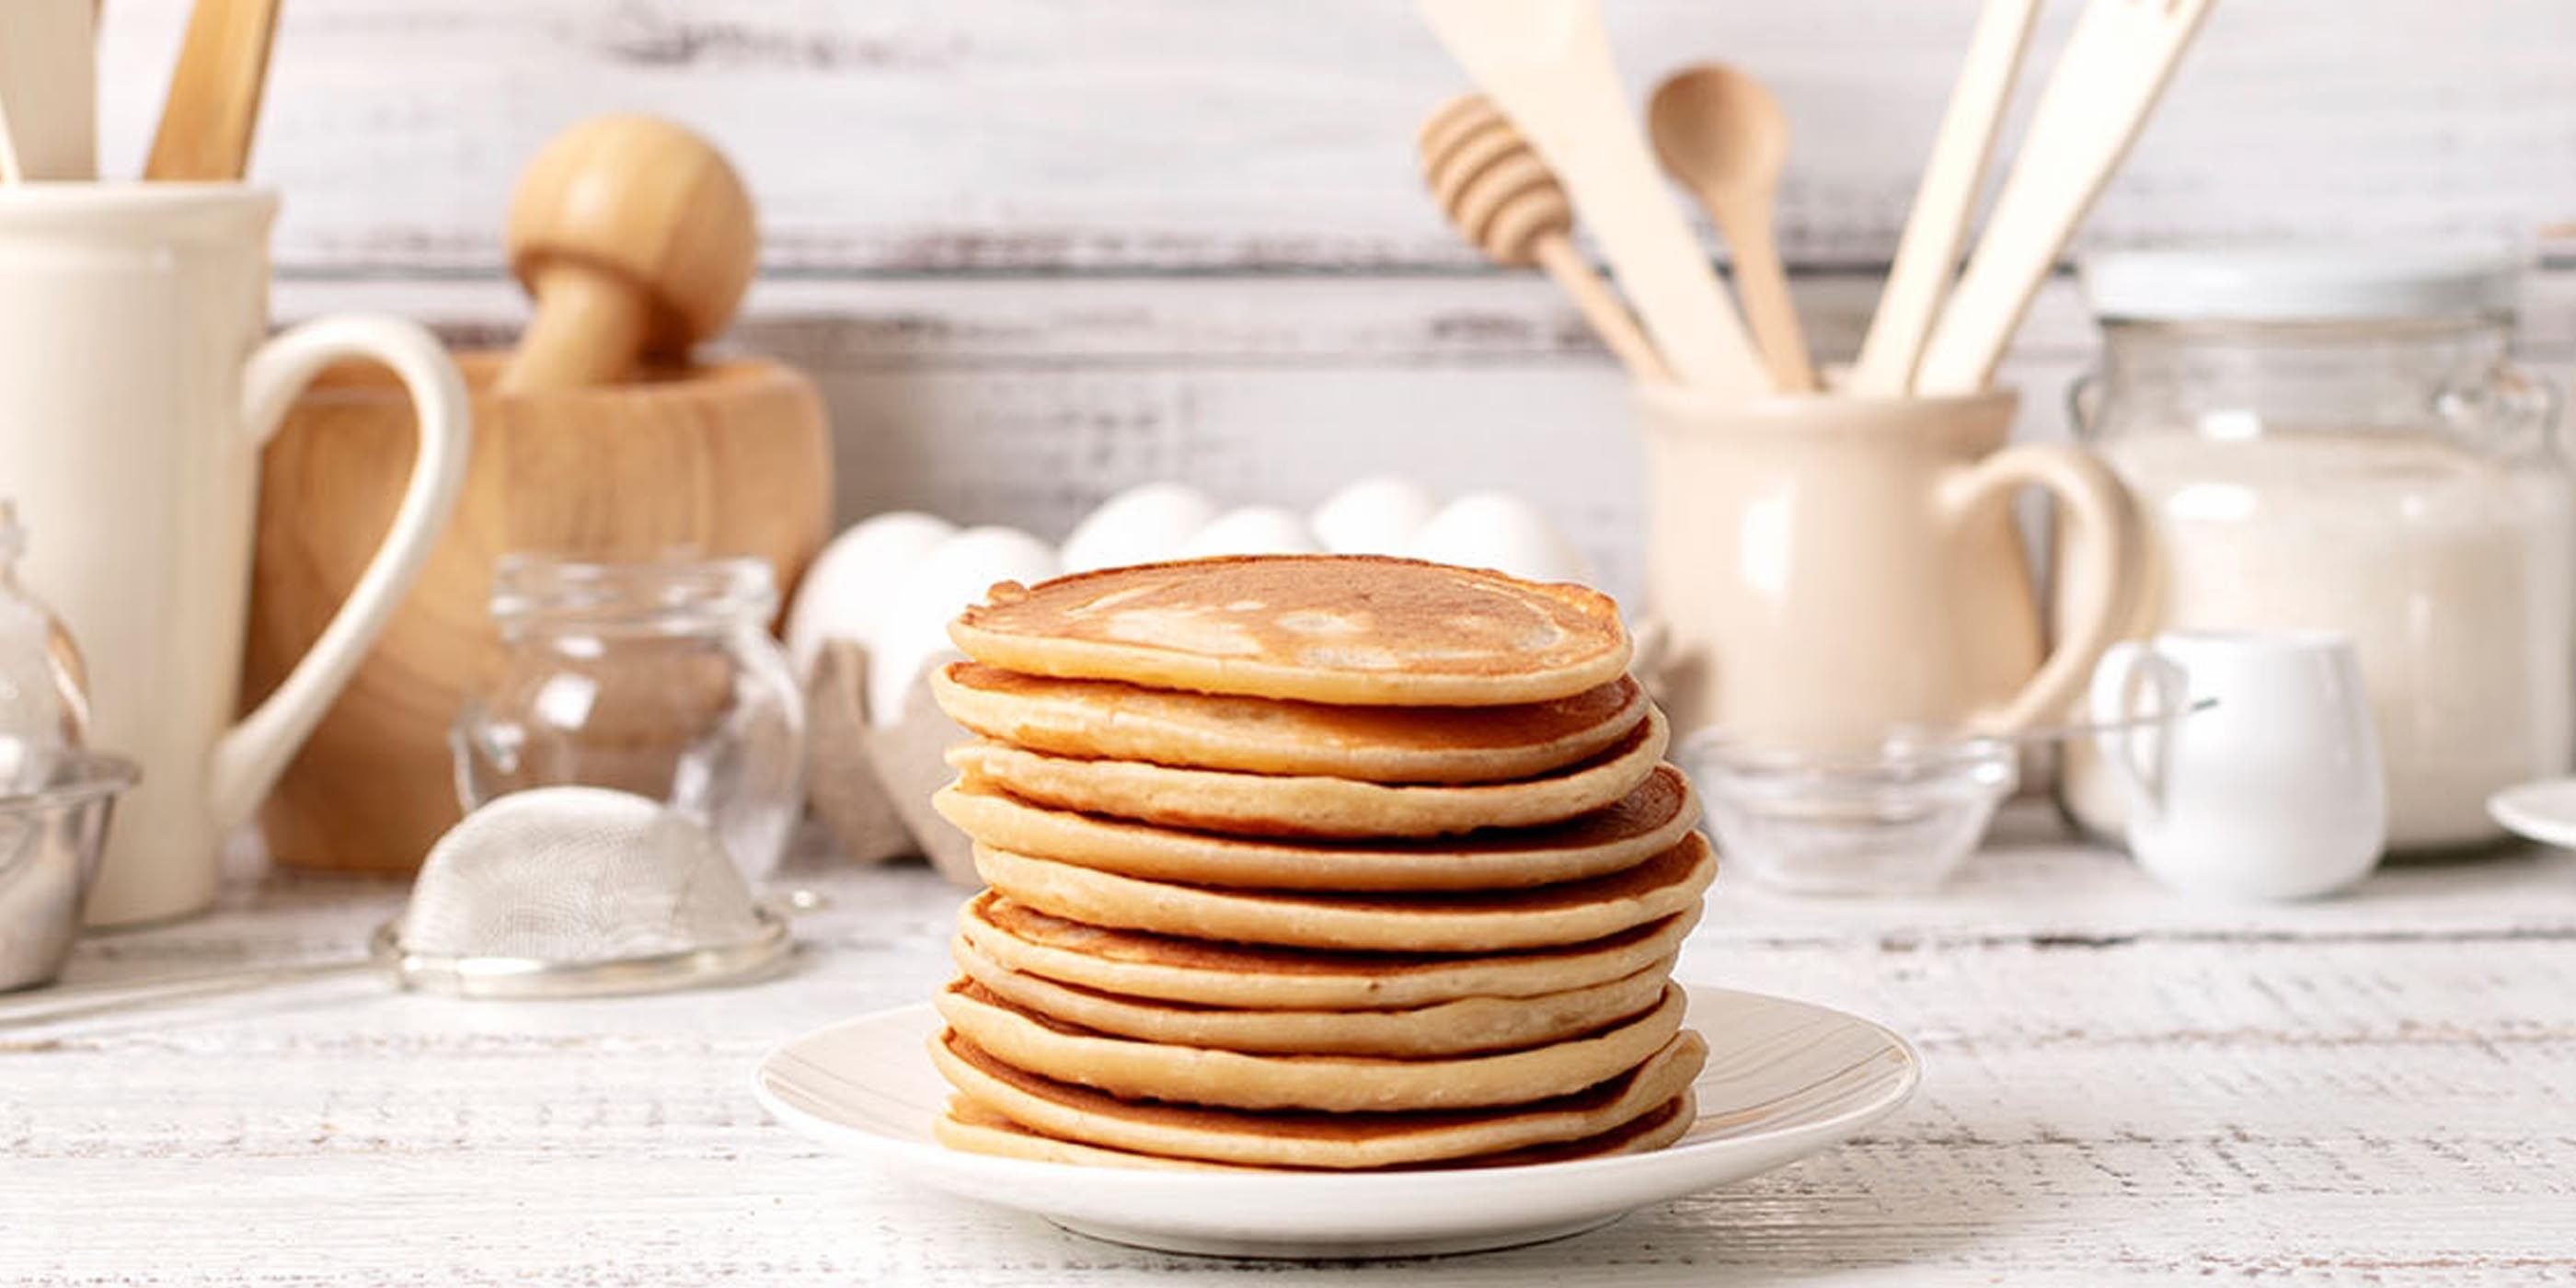 Glutenfree no syrup needed pancakes recipe no calorie